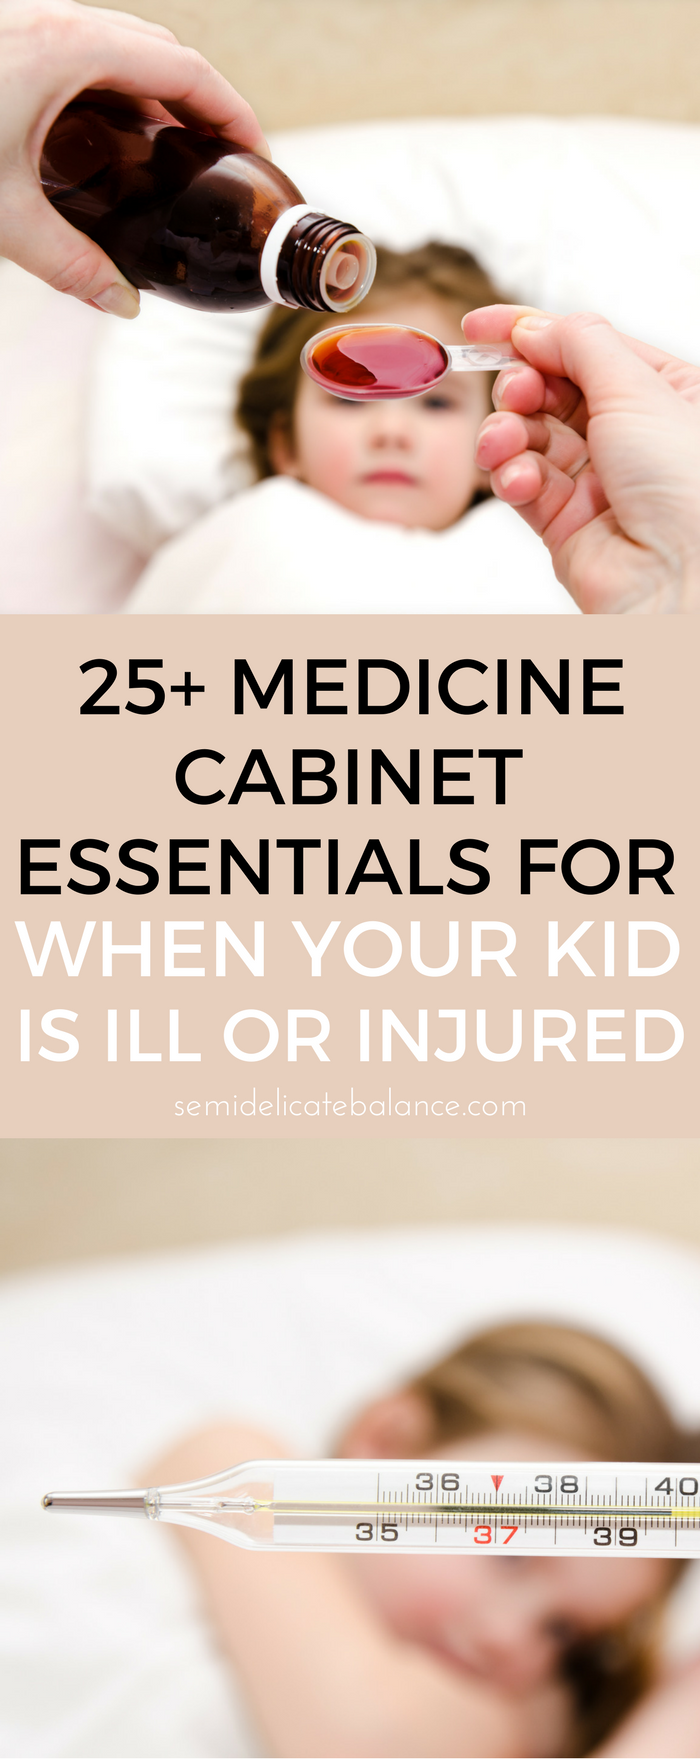 25+ Medicine Cabinet Essentials For When Your Child Gets Sick or Injured